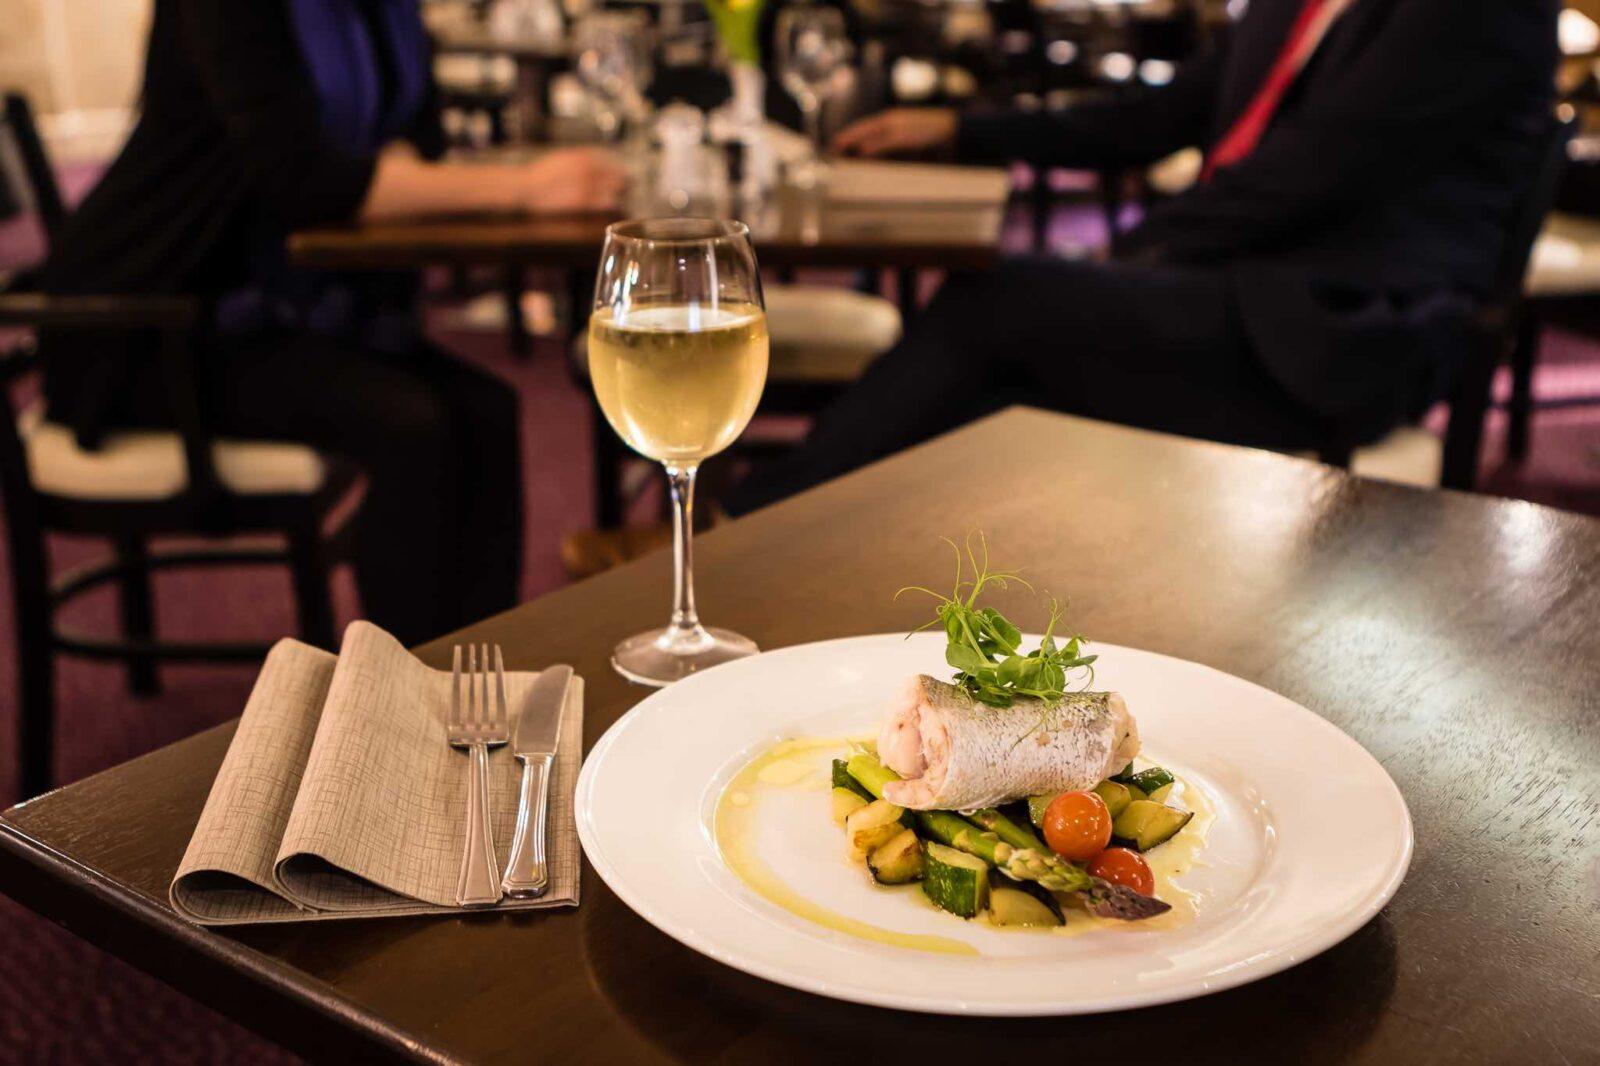 Academy Plaza Hotel wine bottle and fish dish of dublin hotel restaurants